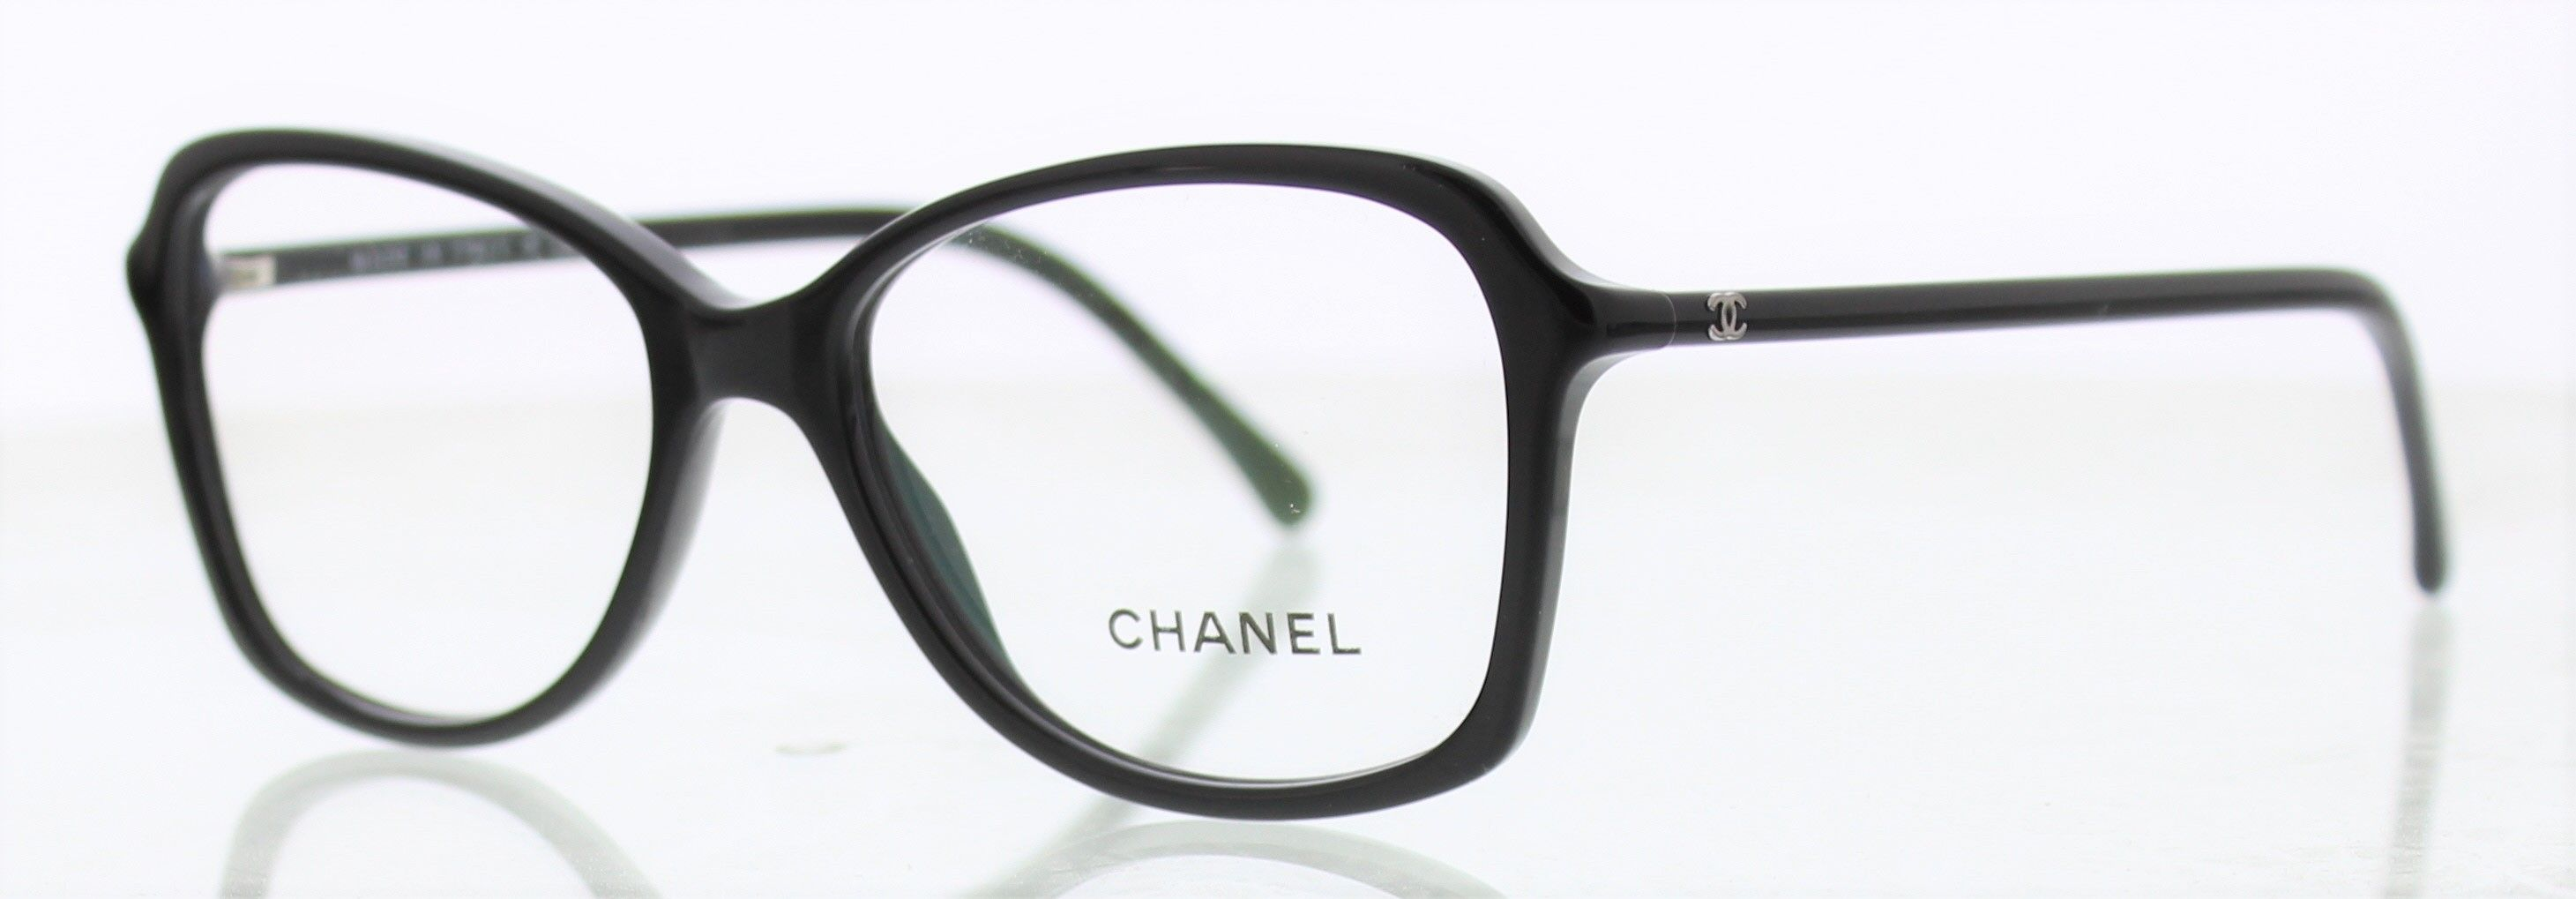 Lunette de vue CHANEL CH3336 1521 femme - prix 216€ - KelOptic   Lunettes    Pinterest   Glasses, Eyewear et Chanel 1b9ffa22082a